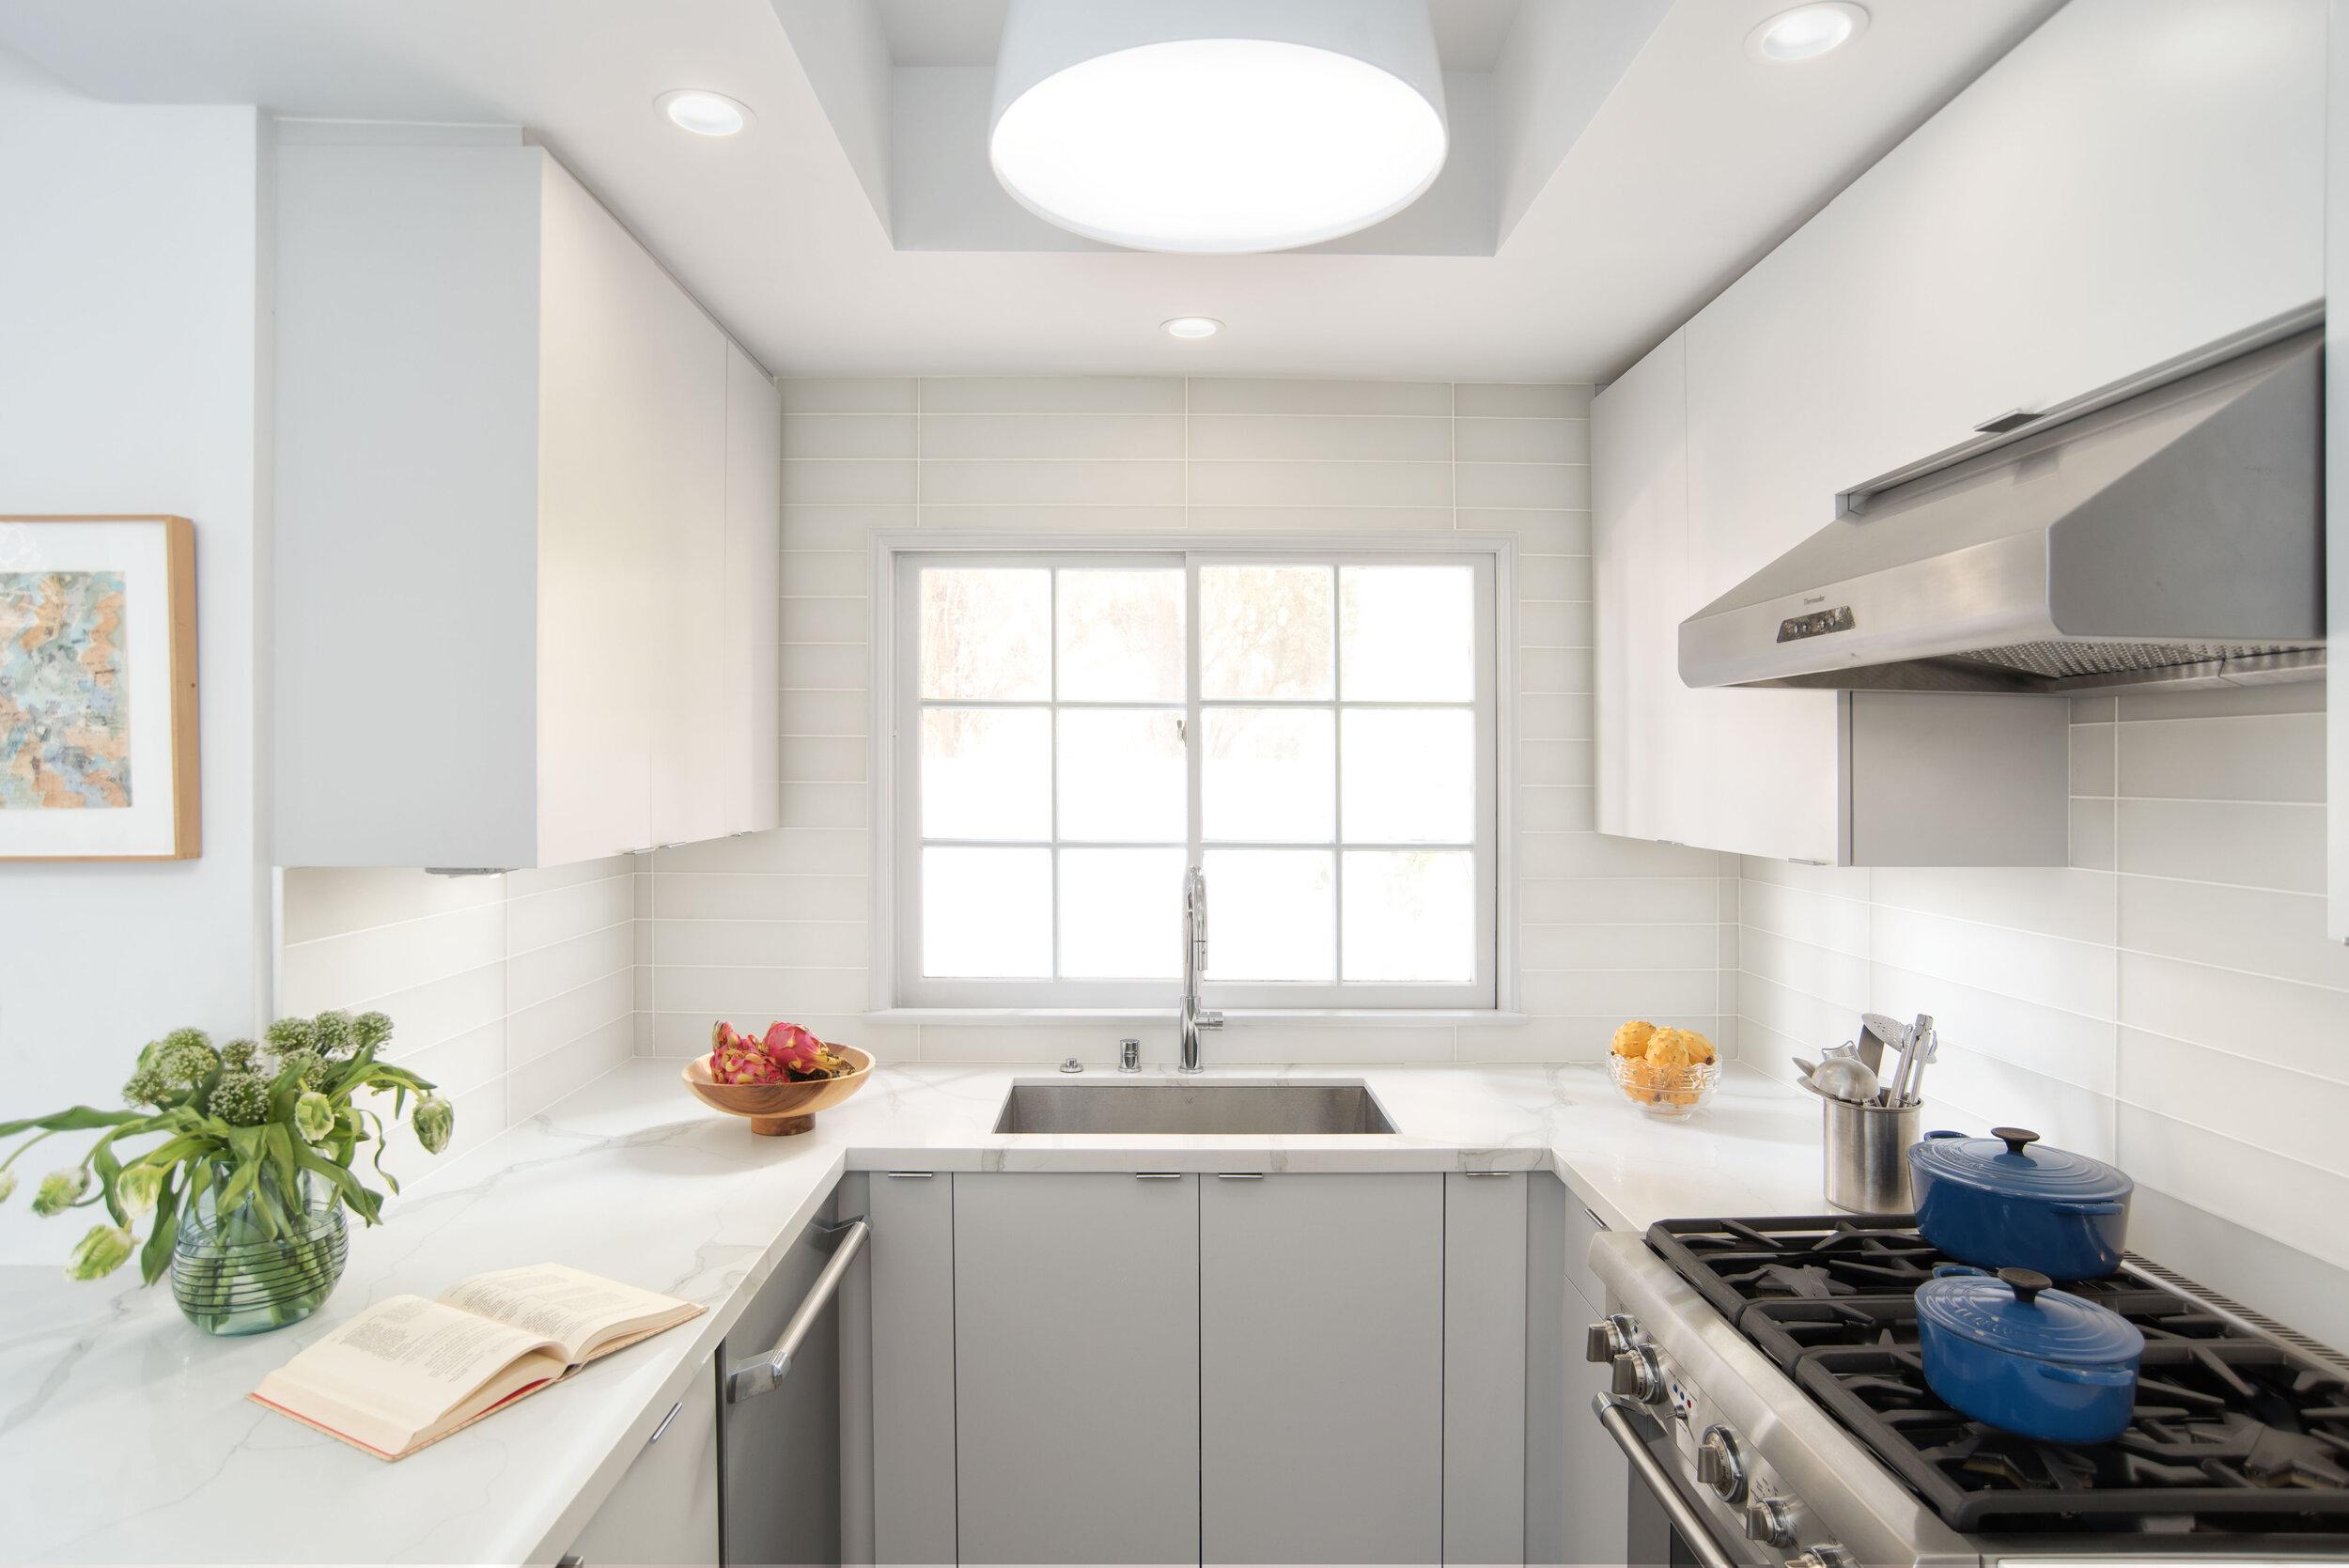 National Kitchen and Bath Association — Sarah Barnard Design ...